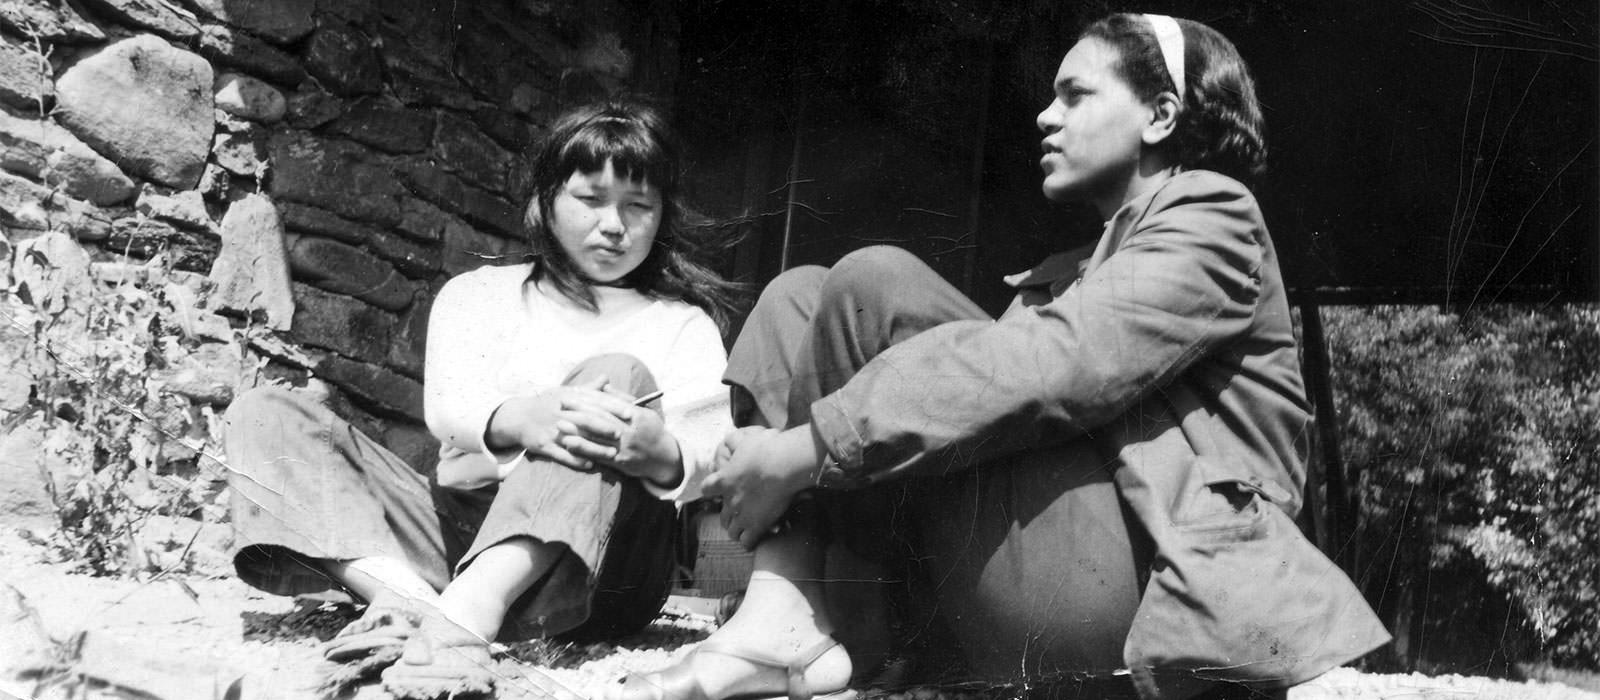 Ruth Asawa and Ora Williams, 1946, both students at Black Mountain College